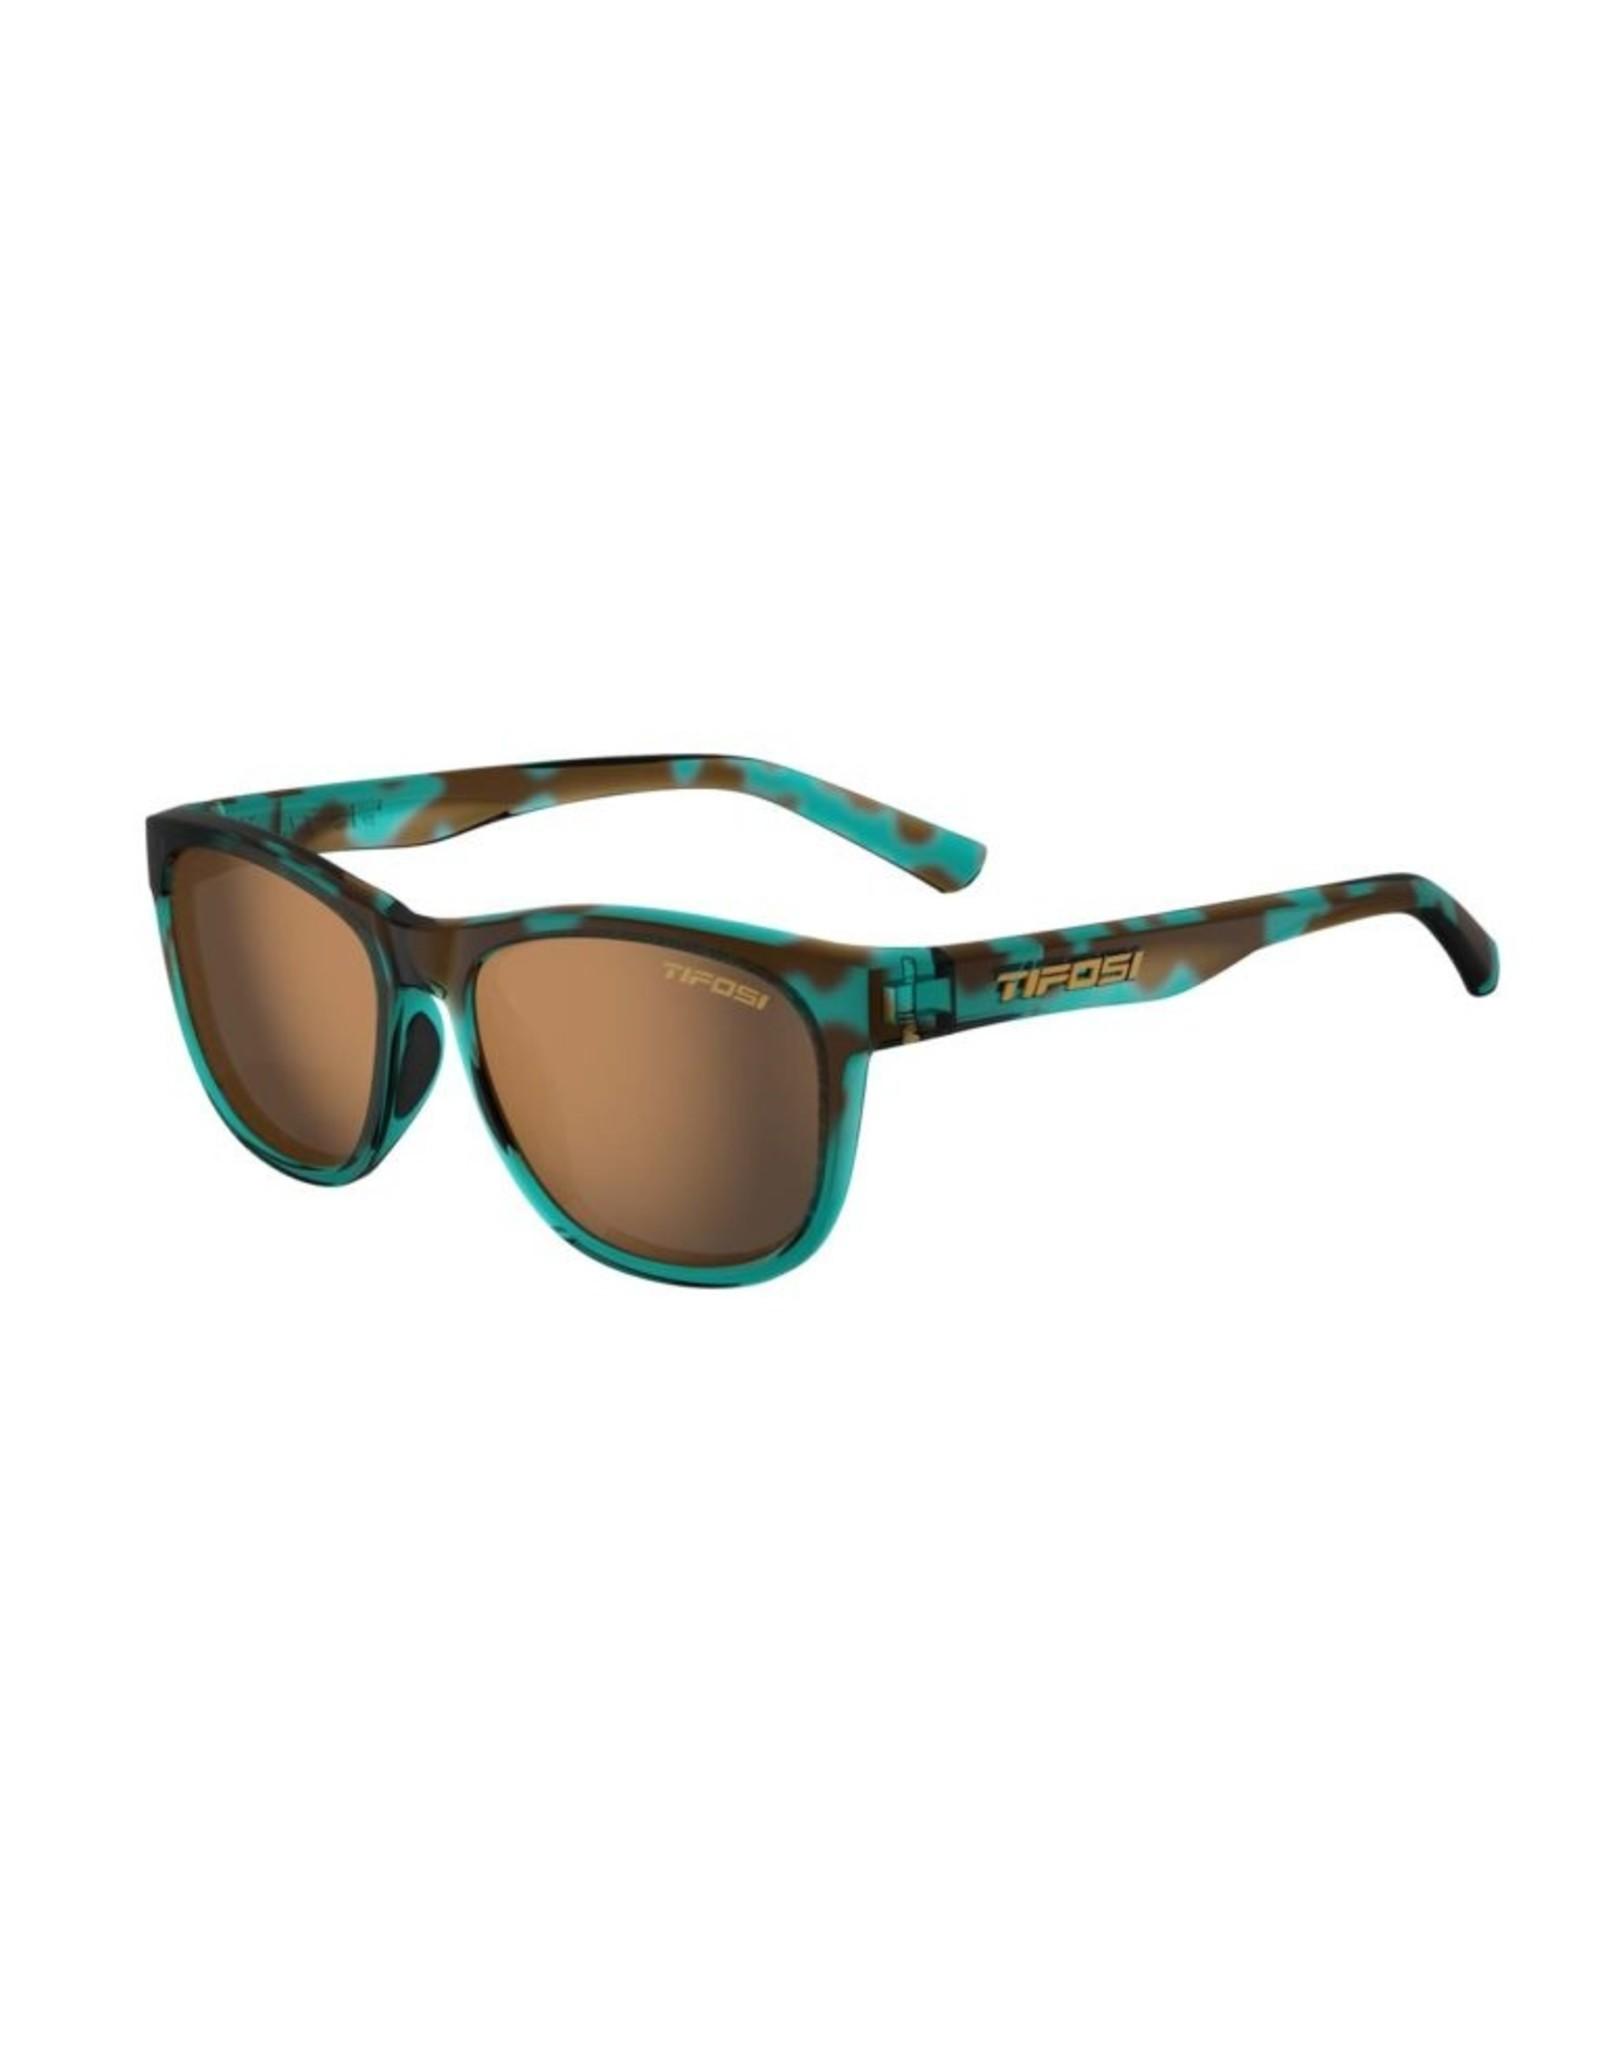 Tifosi Optics Swank, Blue Confetti Polarized Sunglasses - Brown Polarized